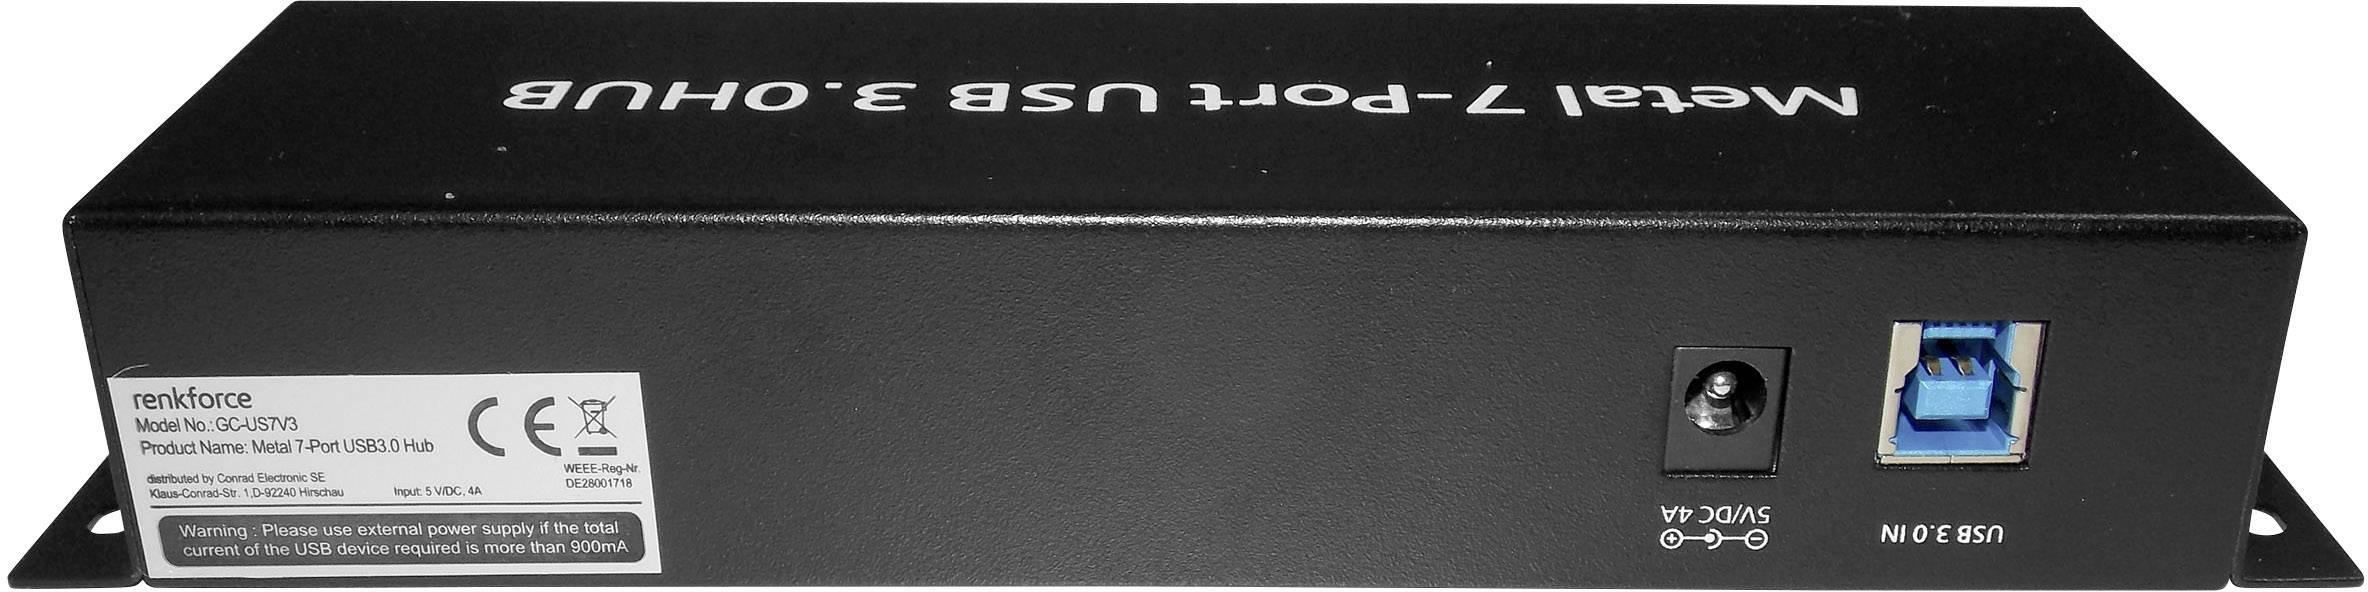 USB 3.0 hub Renkforce RF-3269622 1089874, 7 portů, 55 mm ...